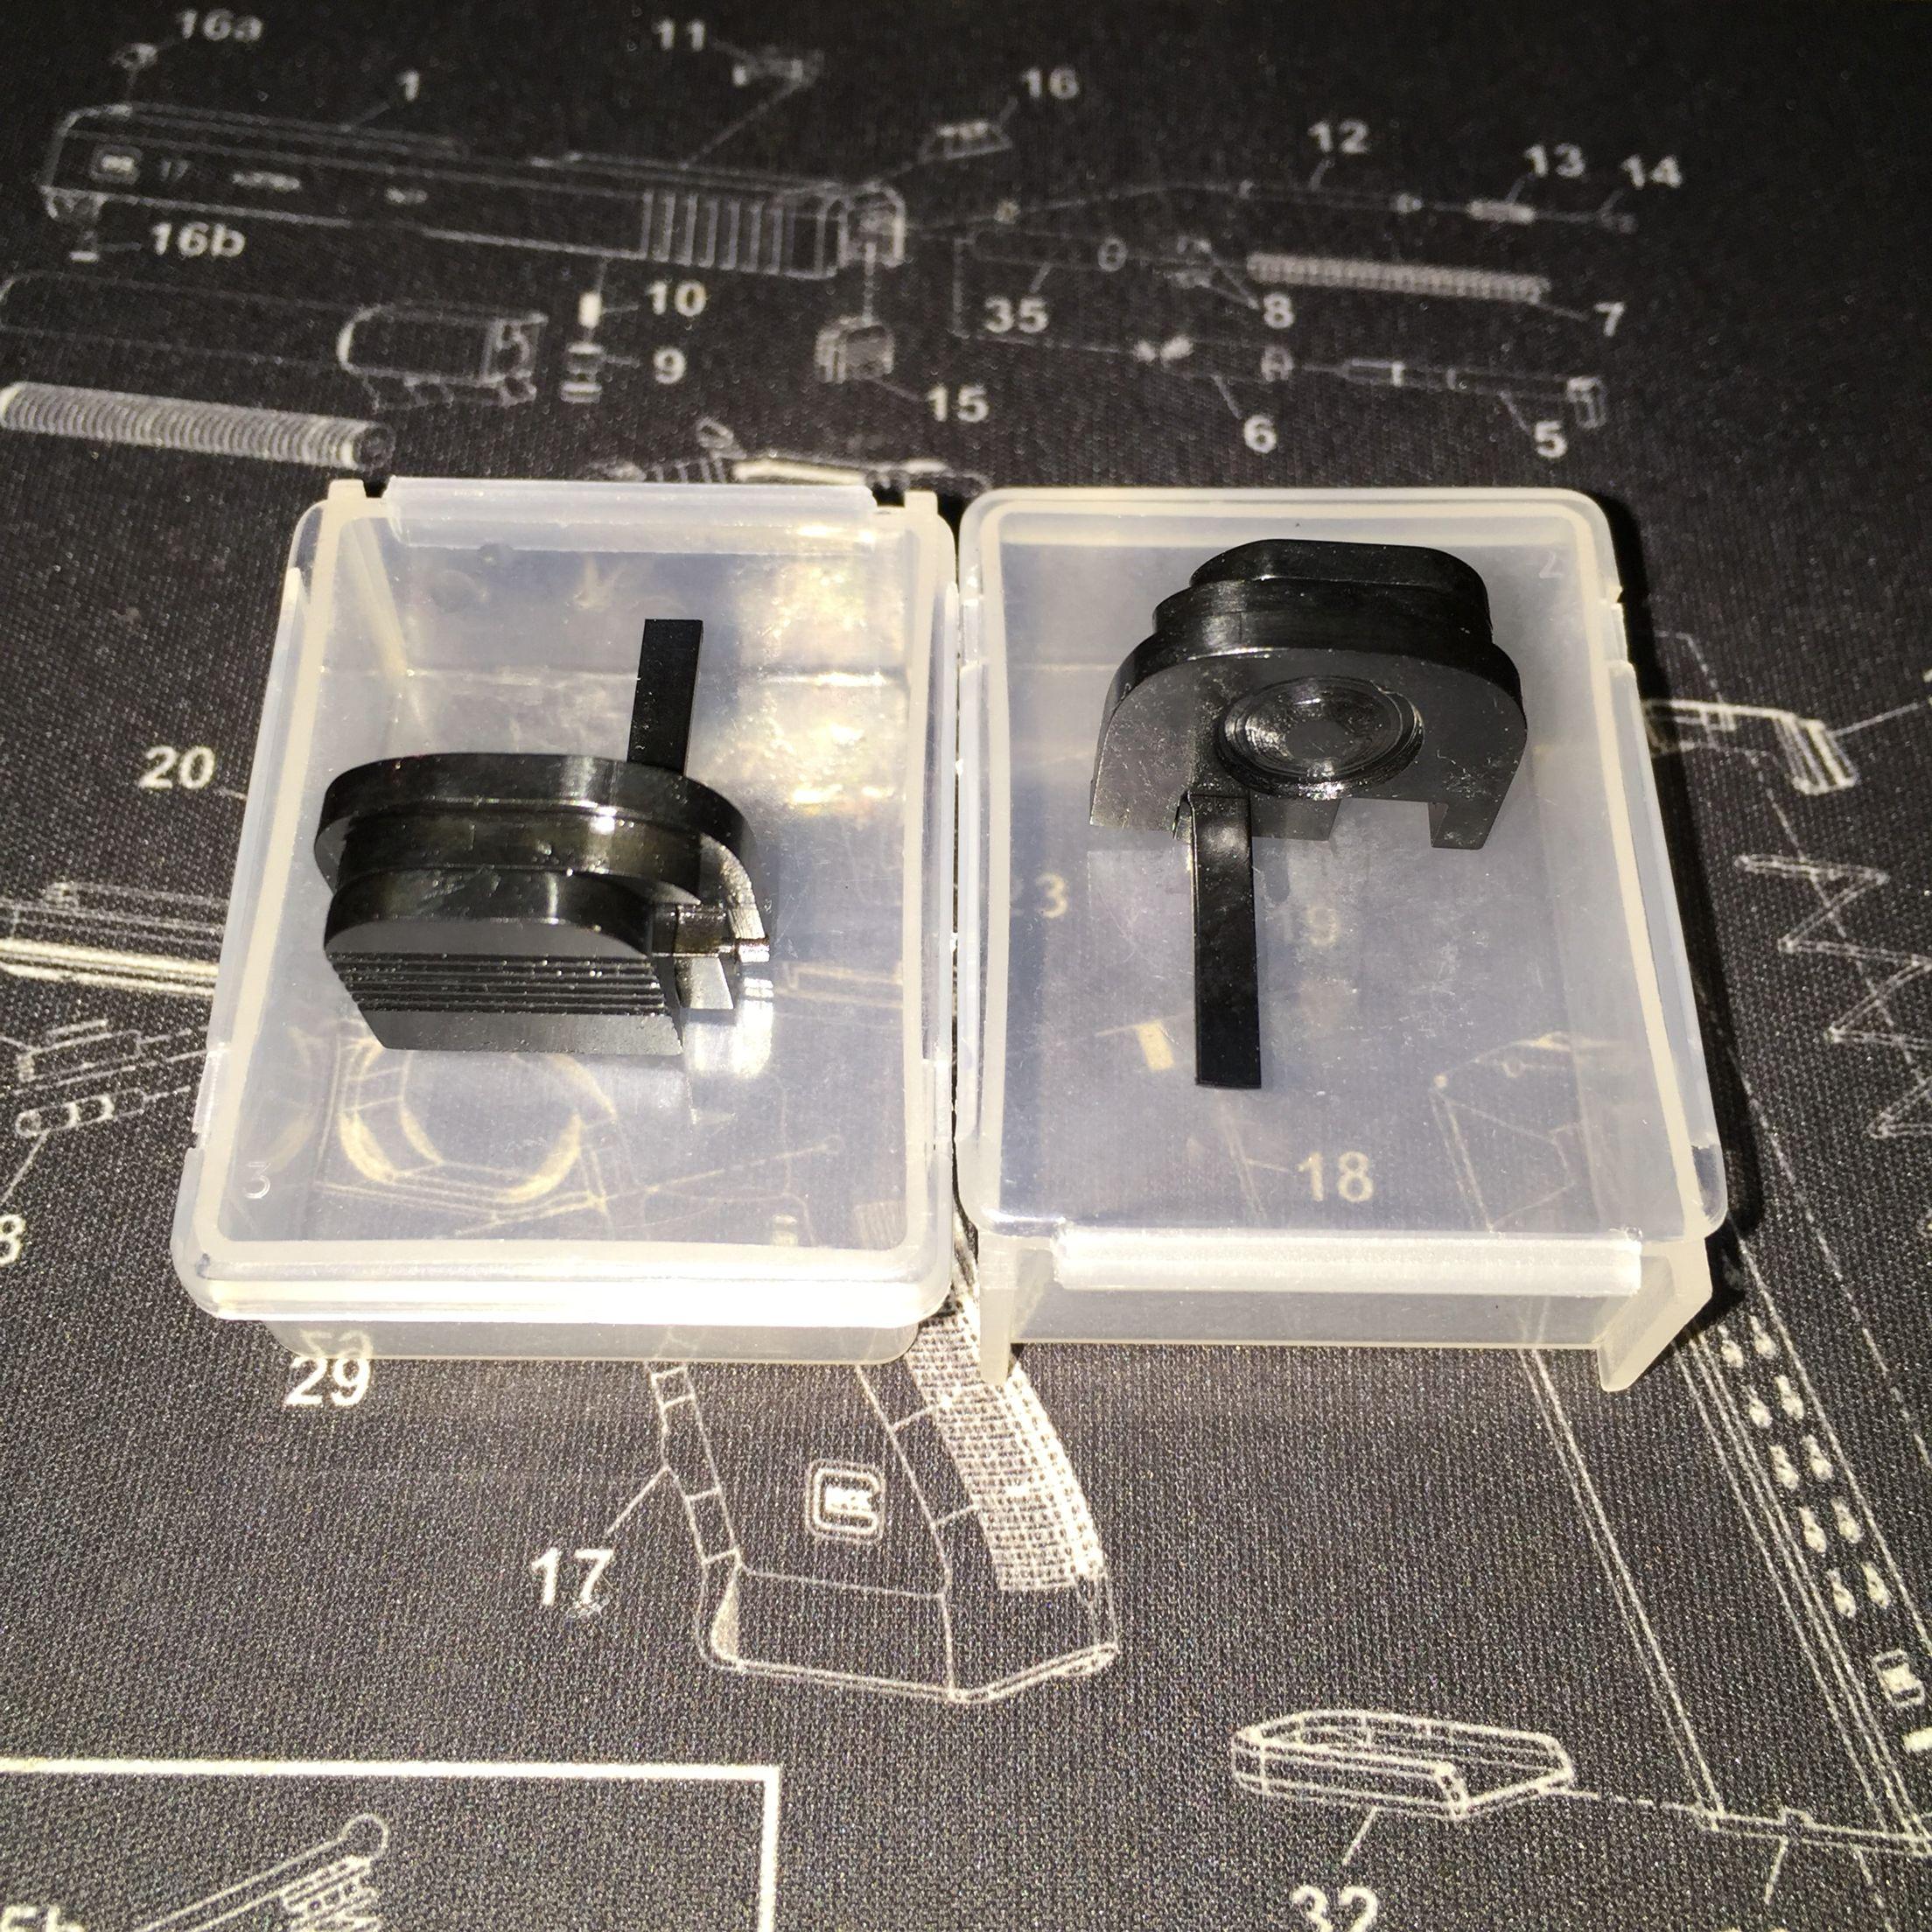 Glock FullAuto Selector Switch for Sale glock